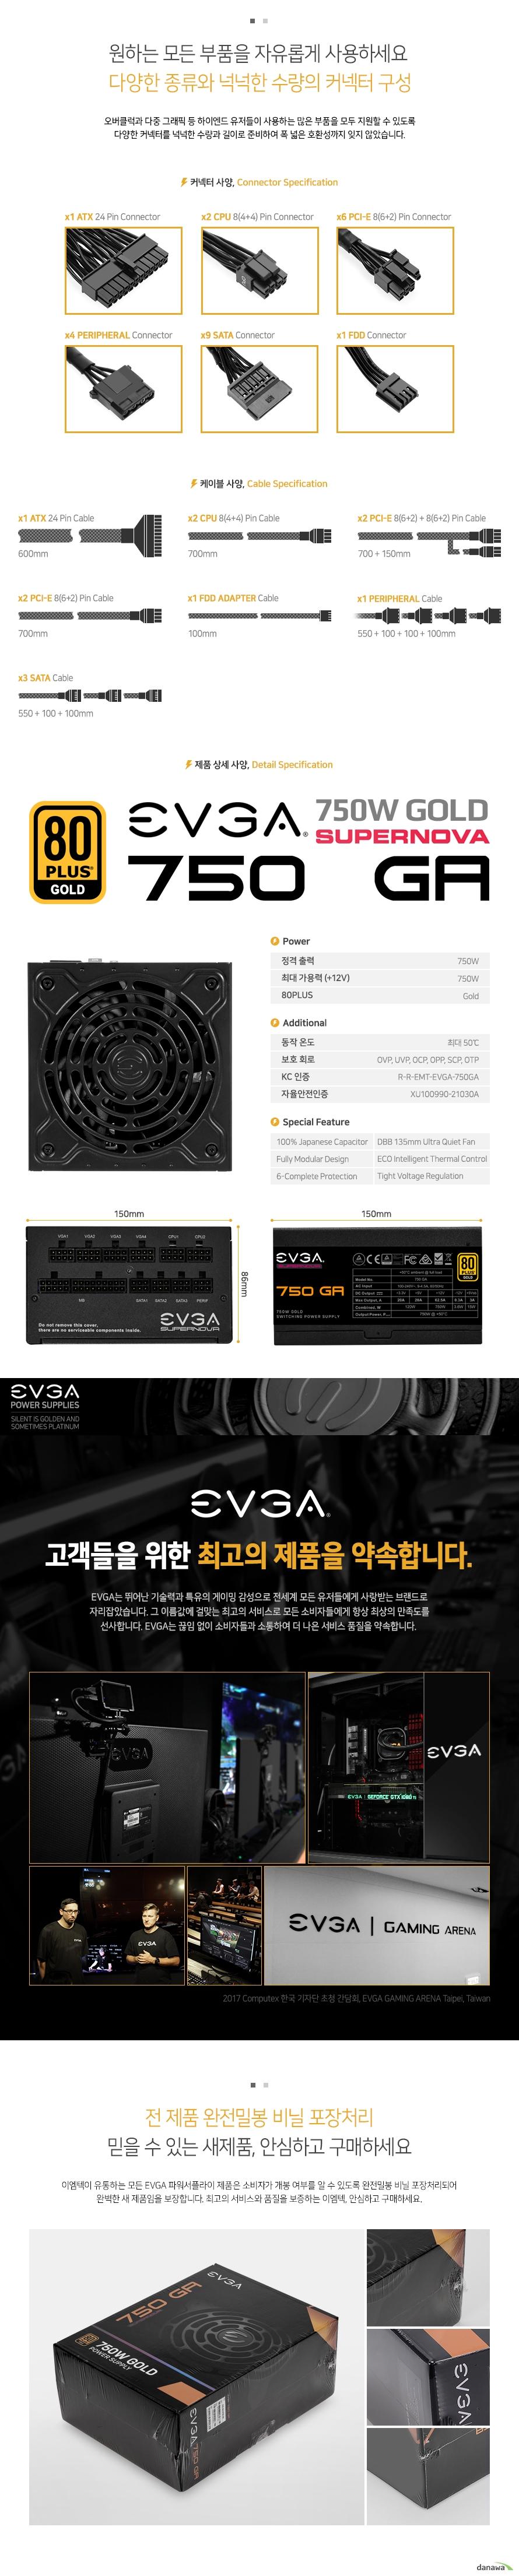 EVGA SUPERNOVA 750 GA 80PLUS GOLD